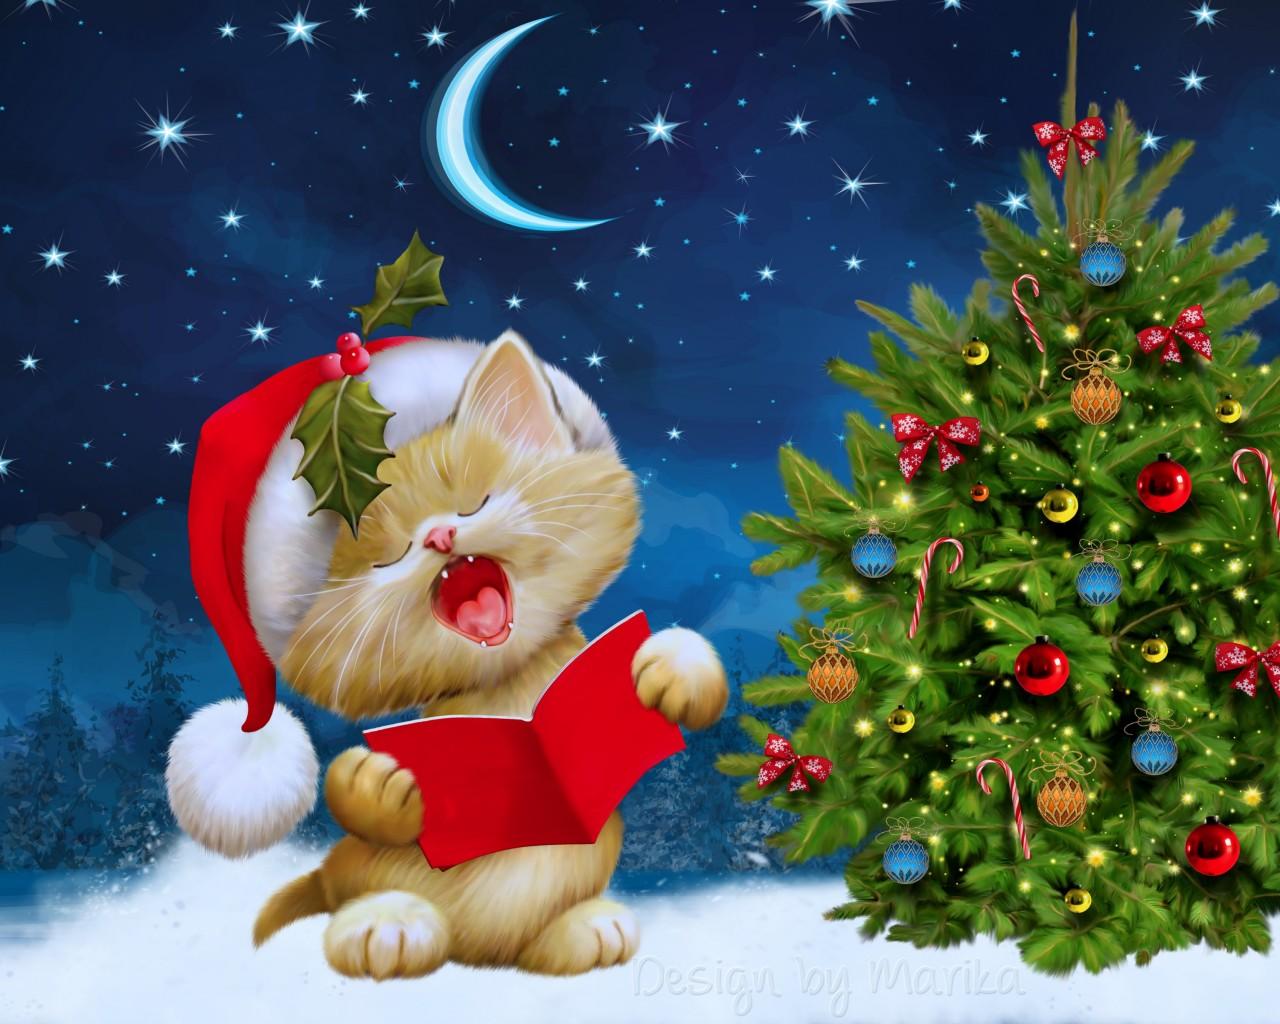 Kitten Singing Christmas Carols Wallpaper for Desktop 1280 x 1024 1280x1024